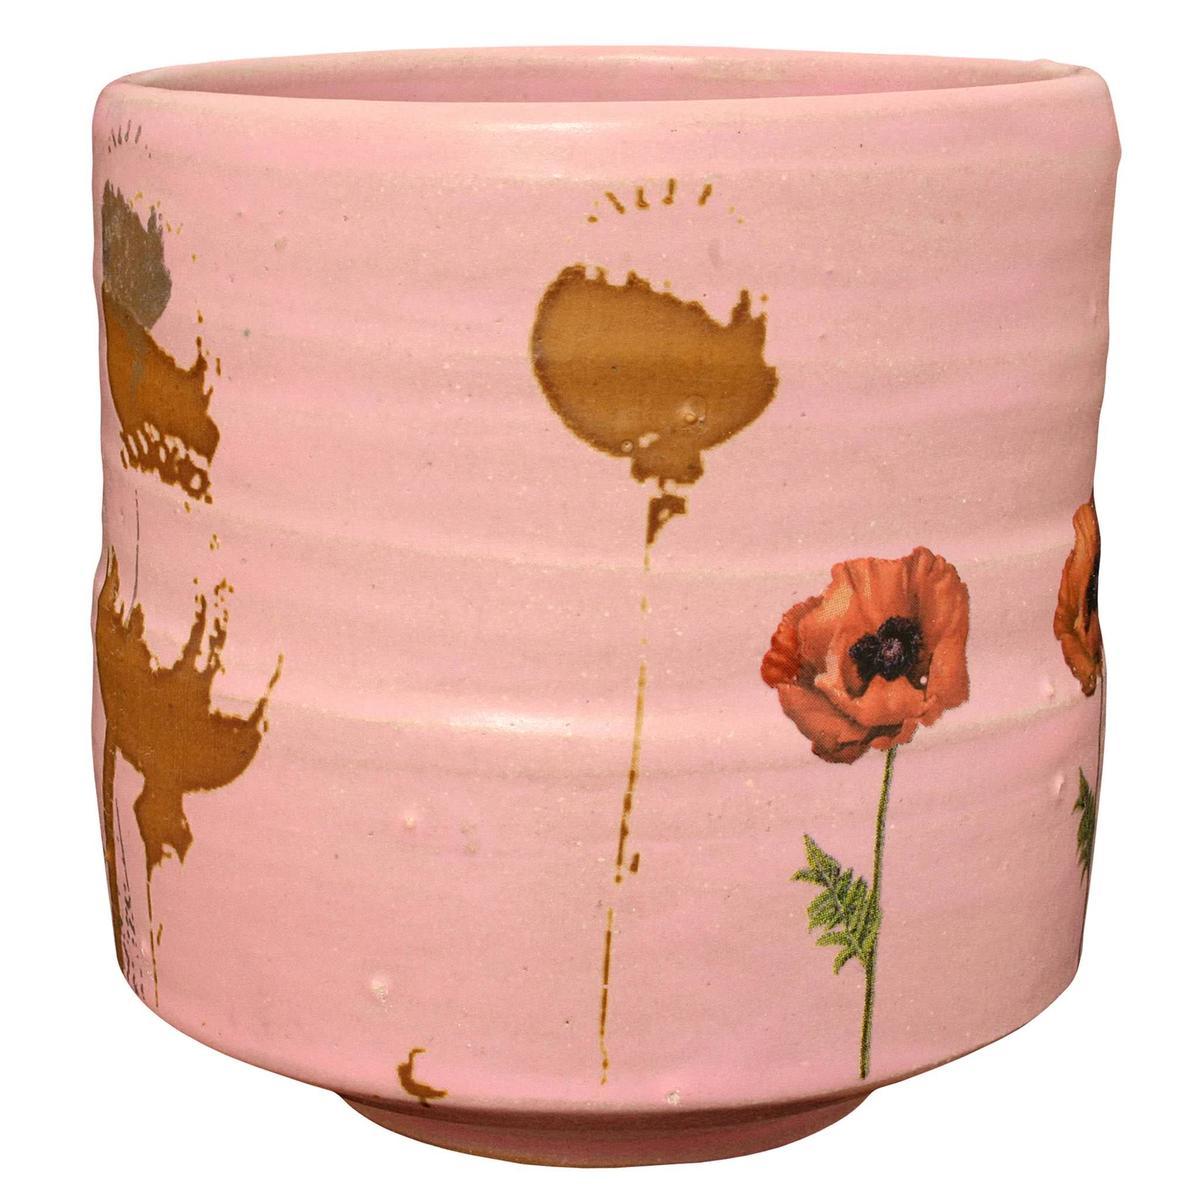 venta de esmalte para cerámica amaco Low Fire Matt Lm-52 pink baja temperatura